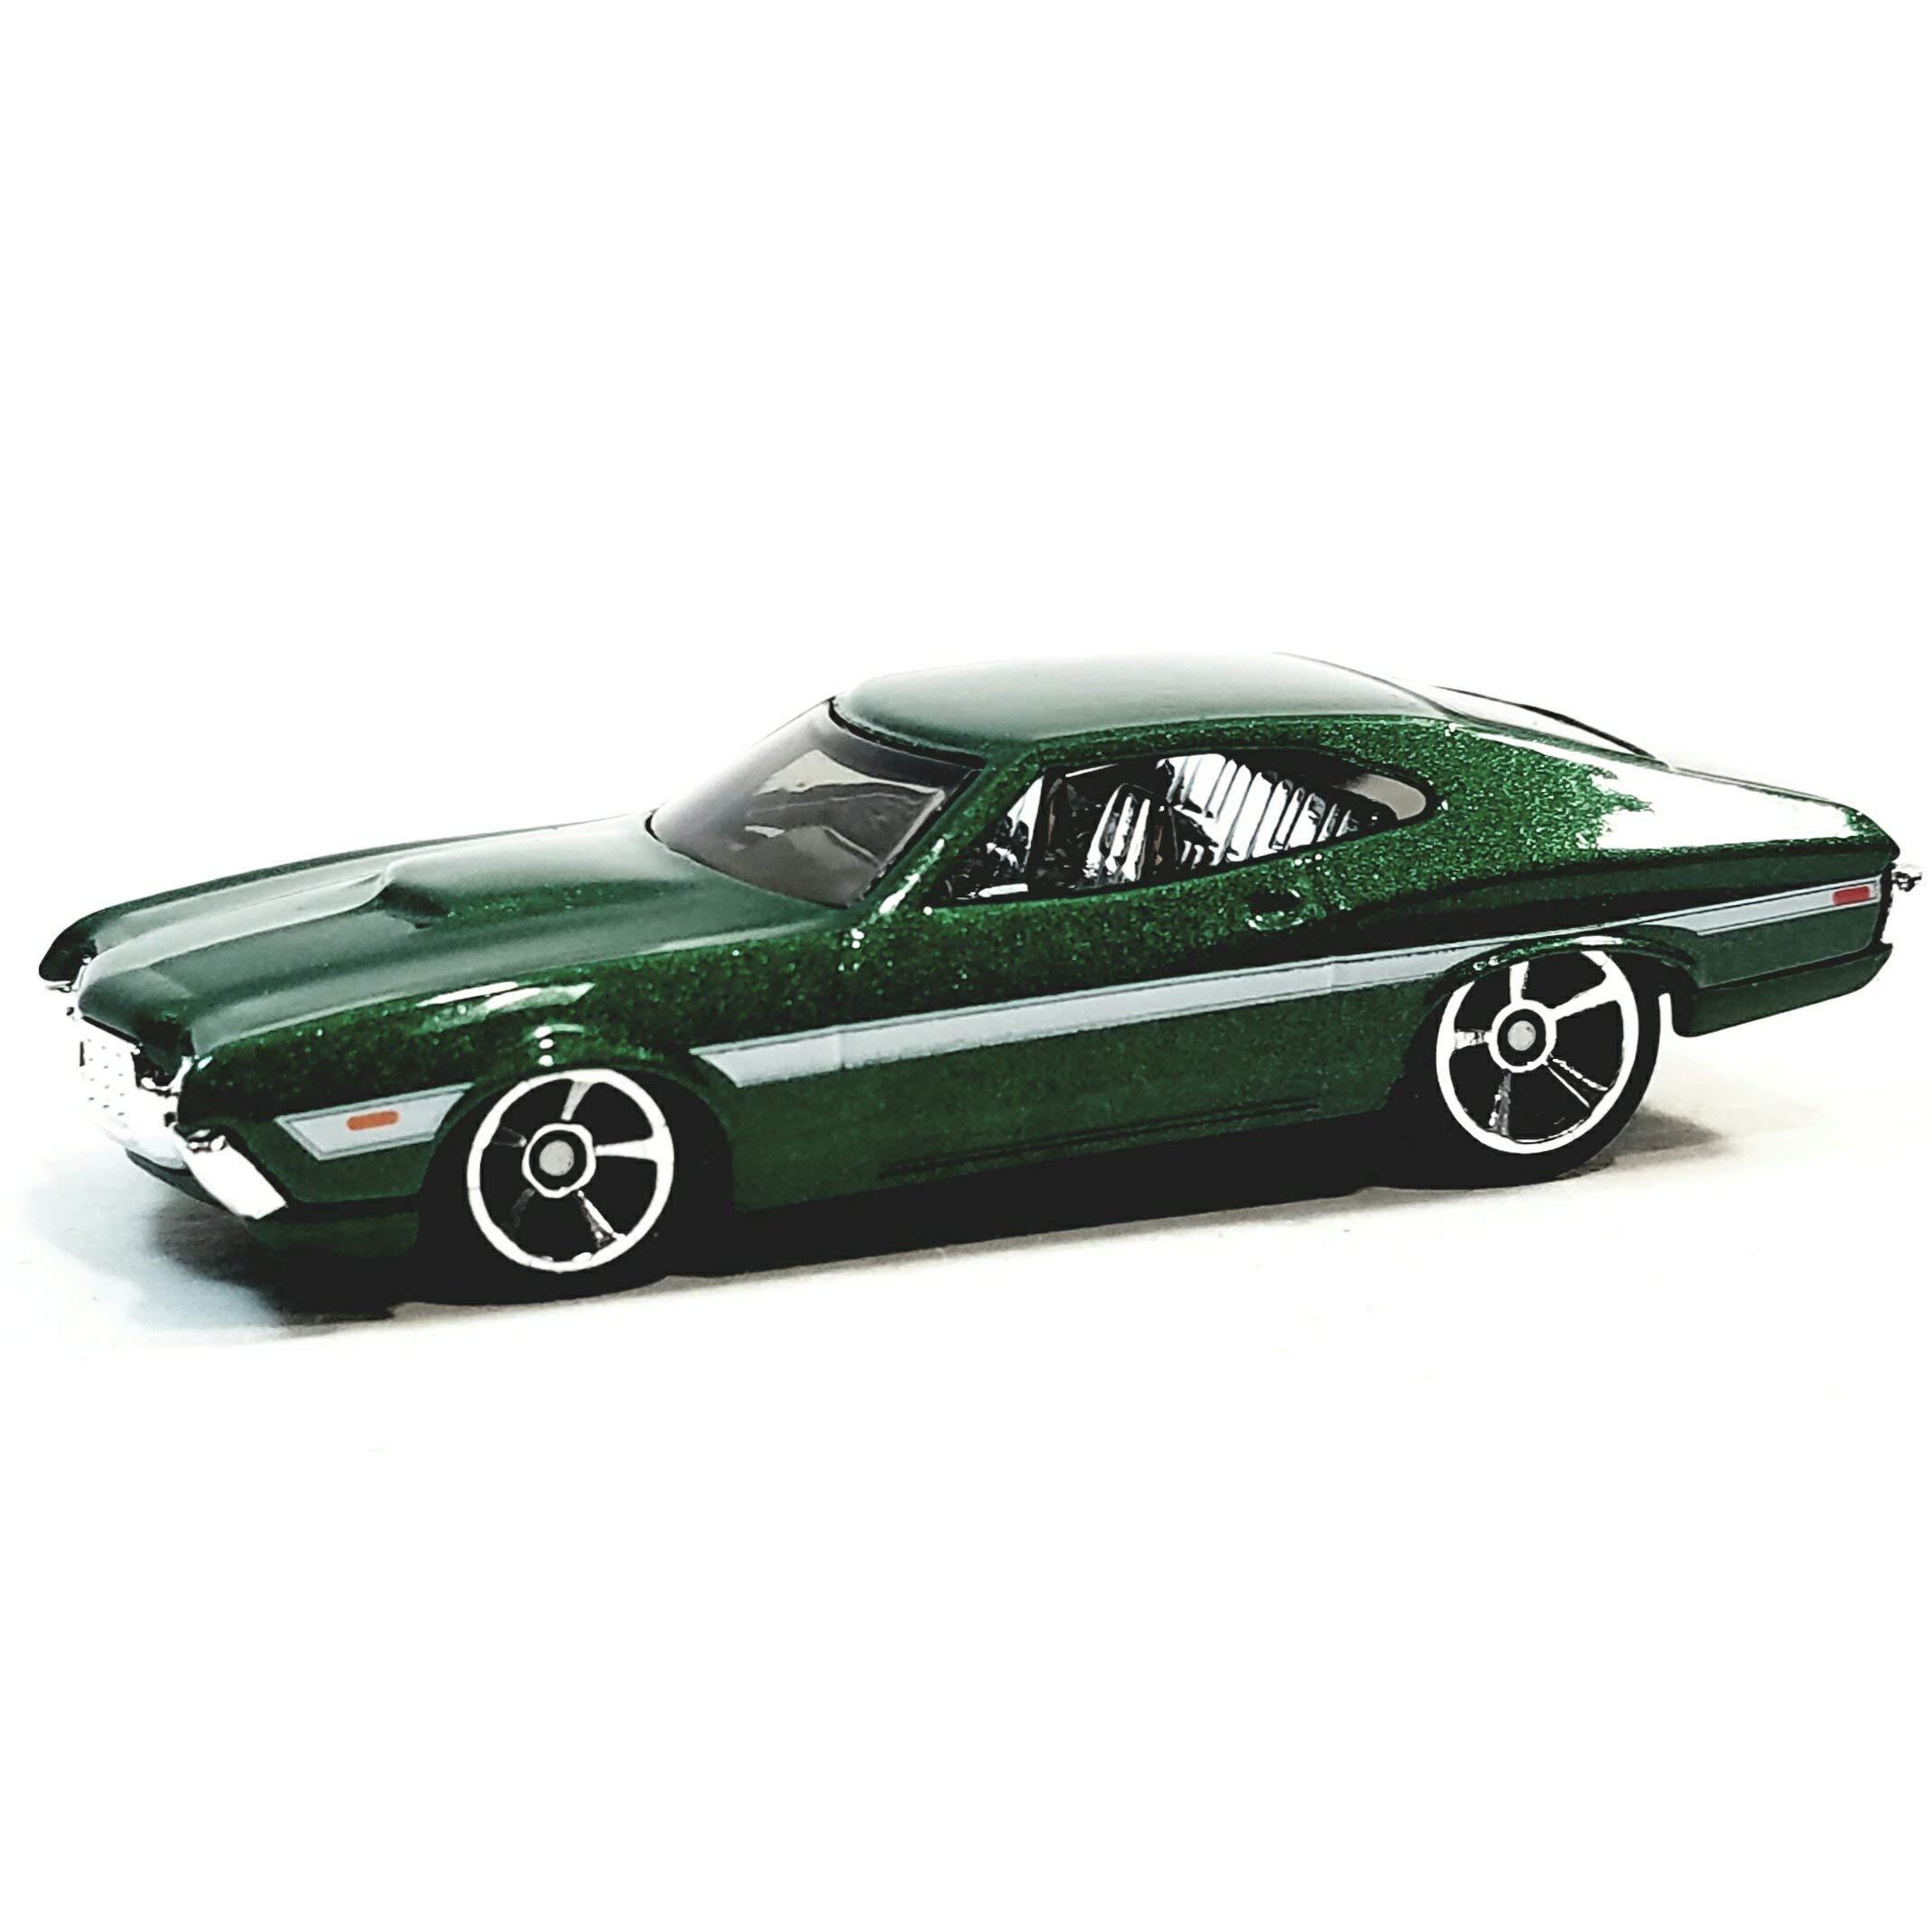 Hot Wheels Fast /& The Furious Fenixs Green 1972 Ford Gran Torino Sport 1//64 Scale Diecast Car